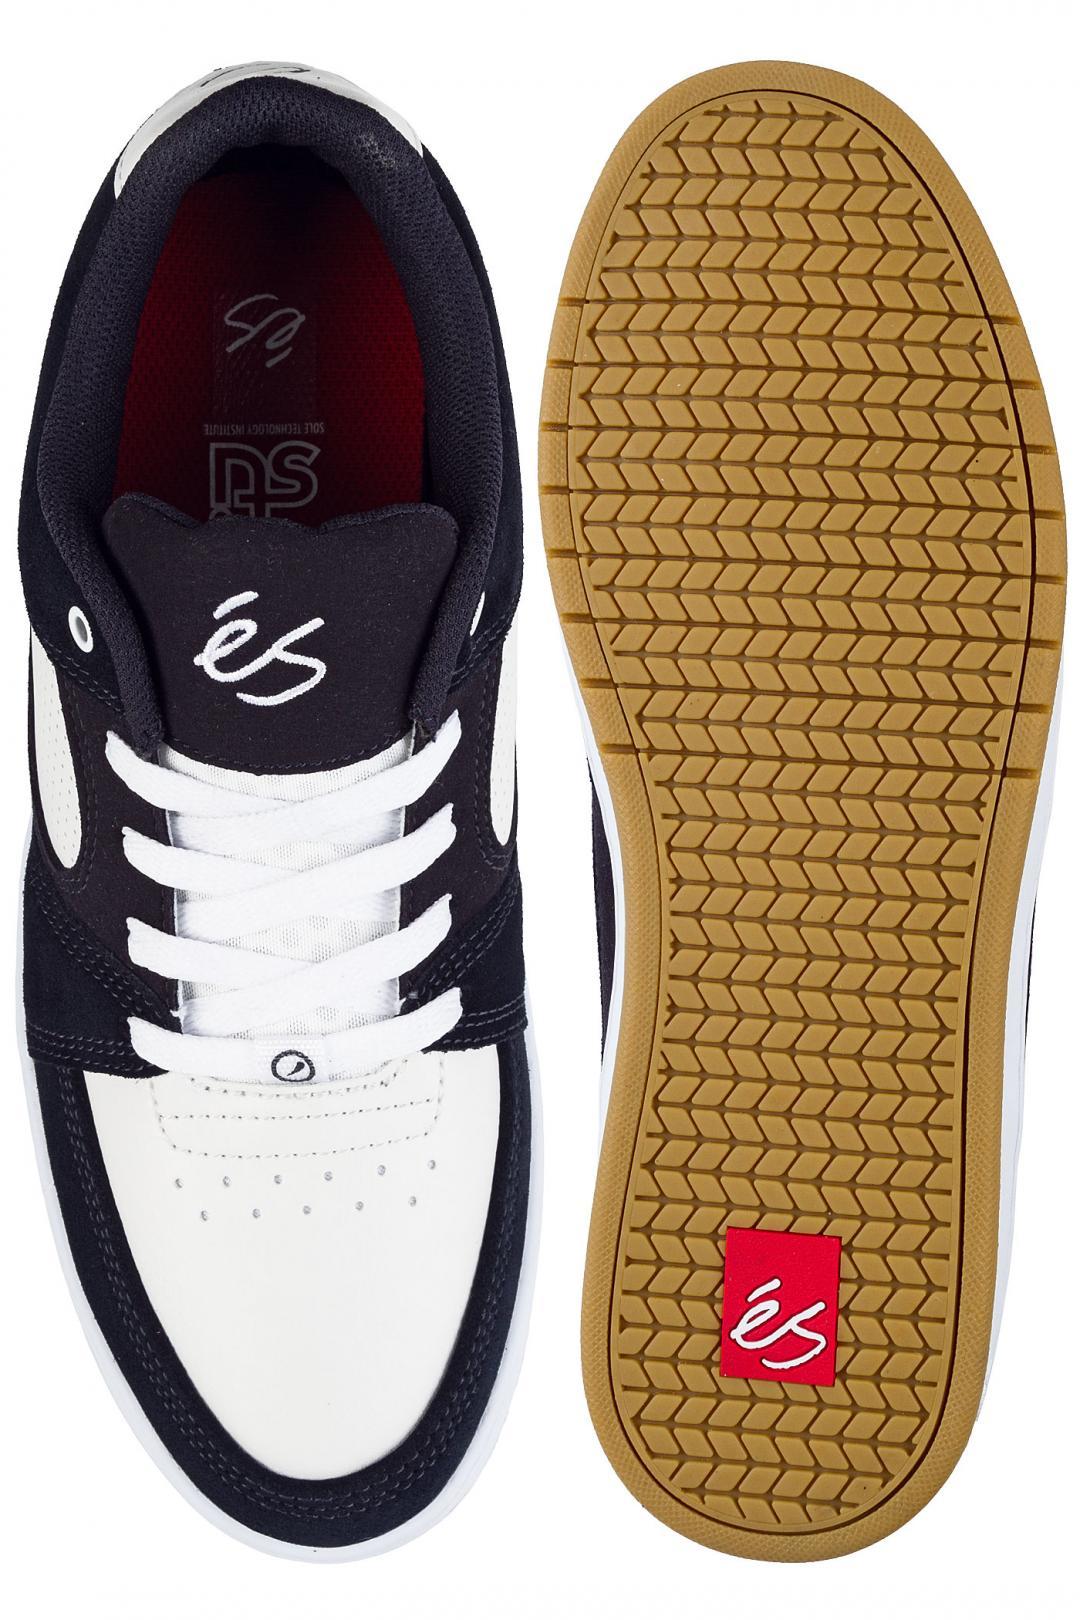 Uomo éS Accel Slim navy white   Sneaker